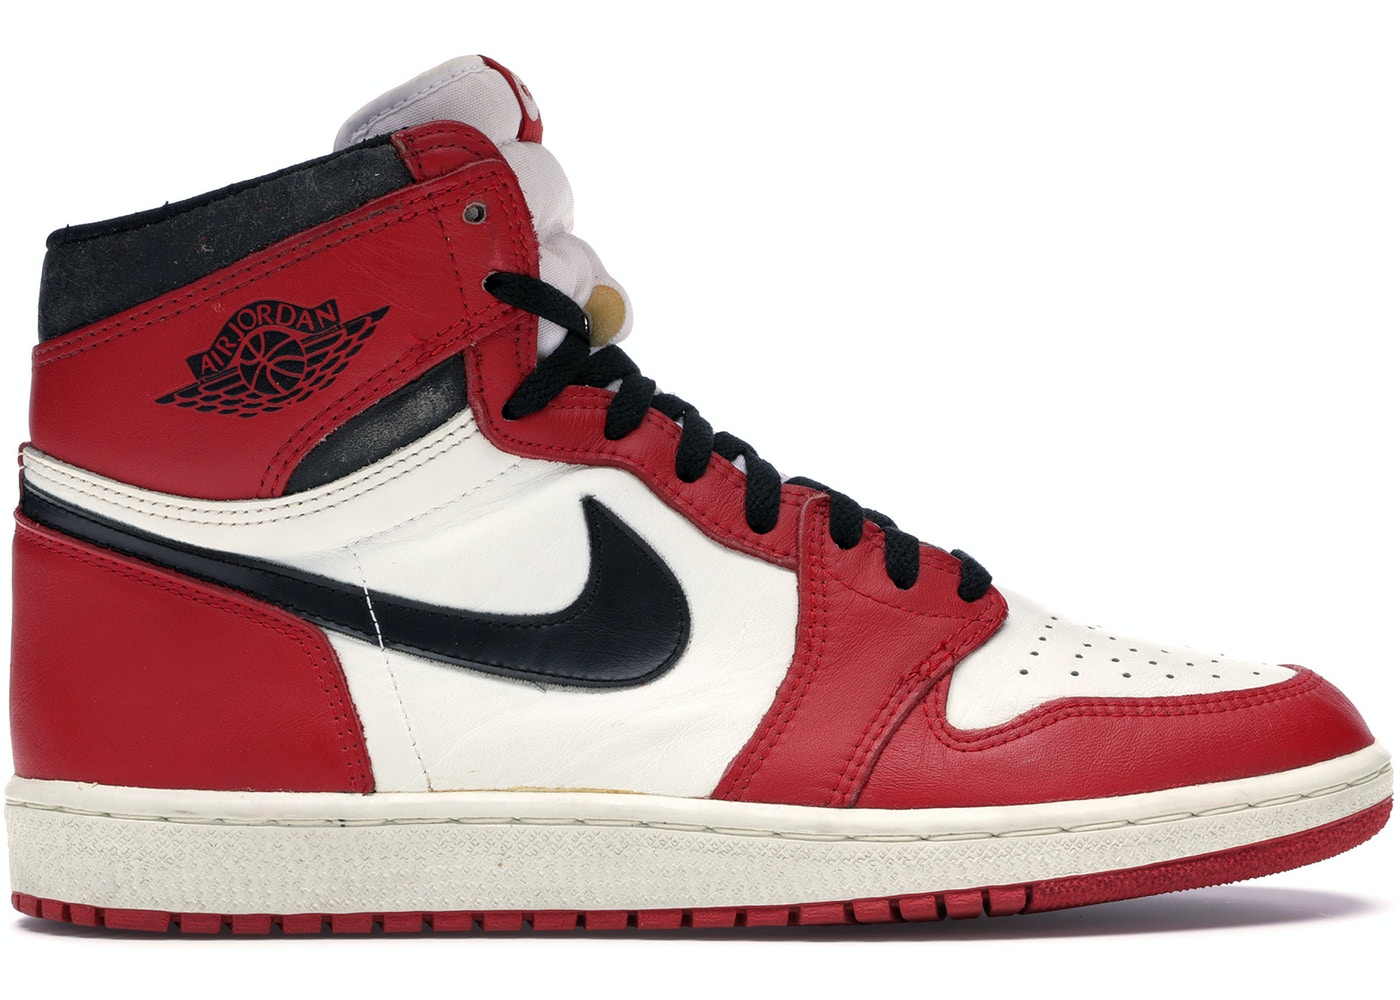 387d1426a00 Jordan 1 OG Chicago (1985) - 4280